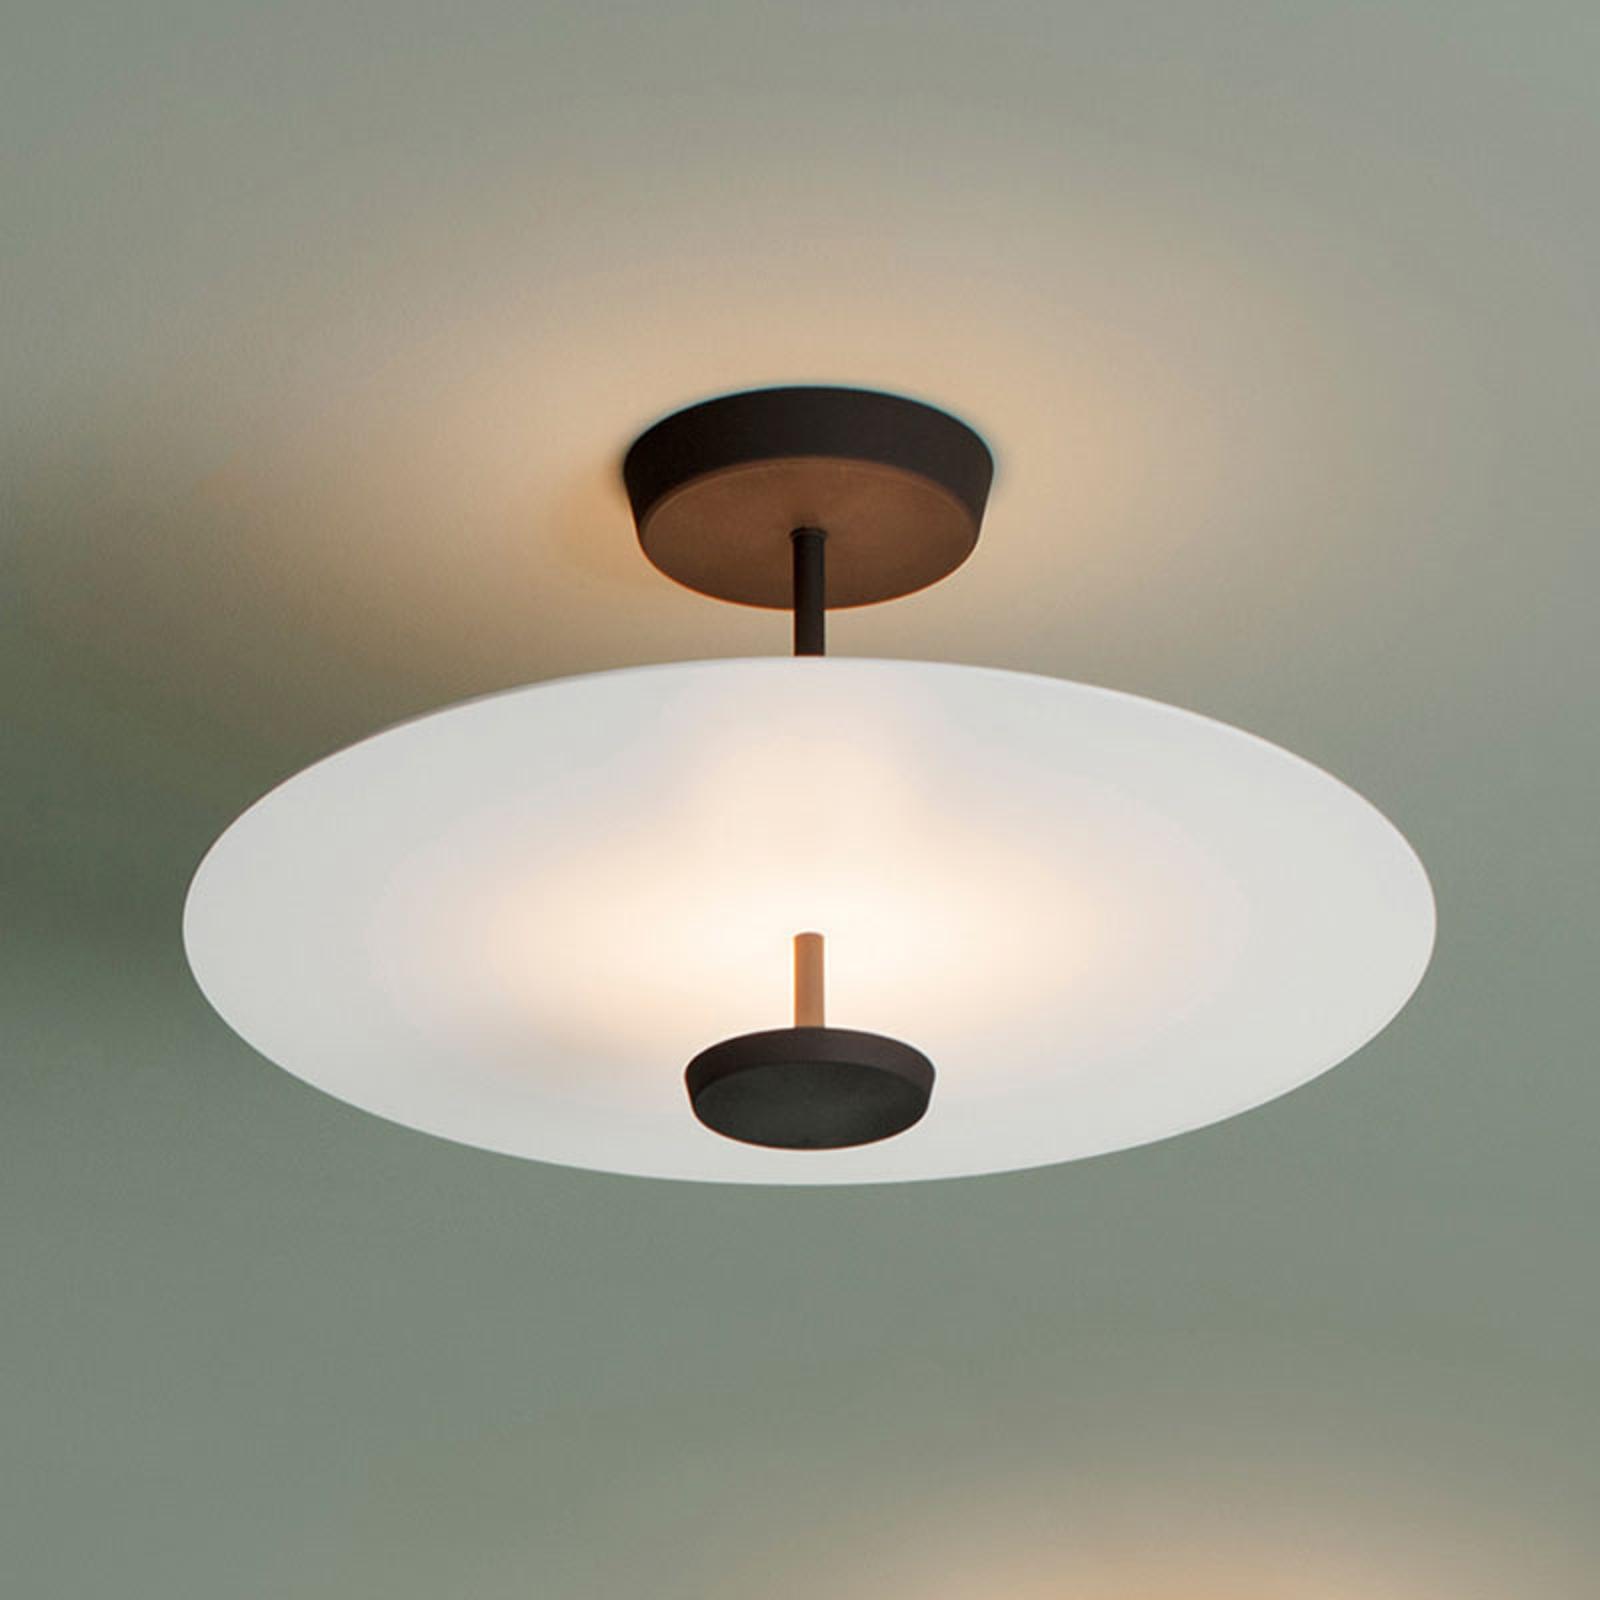 Vibia Flat LED-loftlampe, 2 lyskilder Ø 55 cm hvid